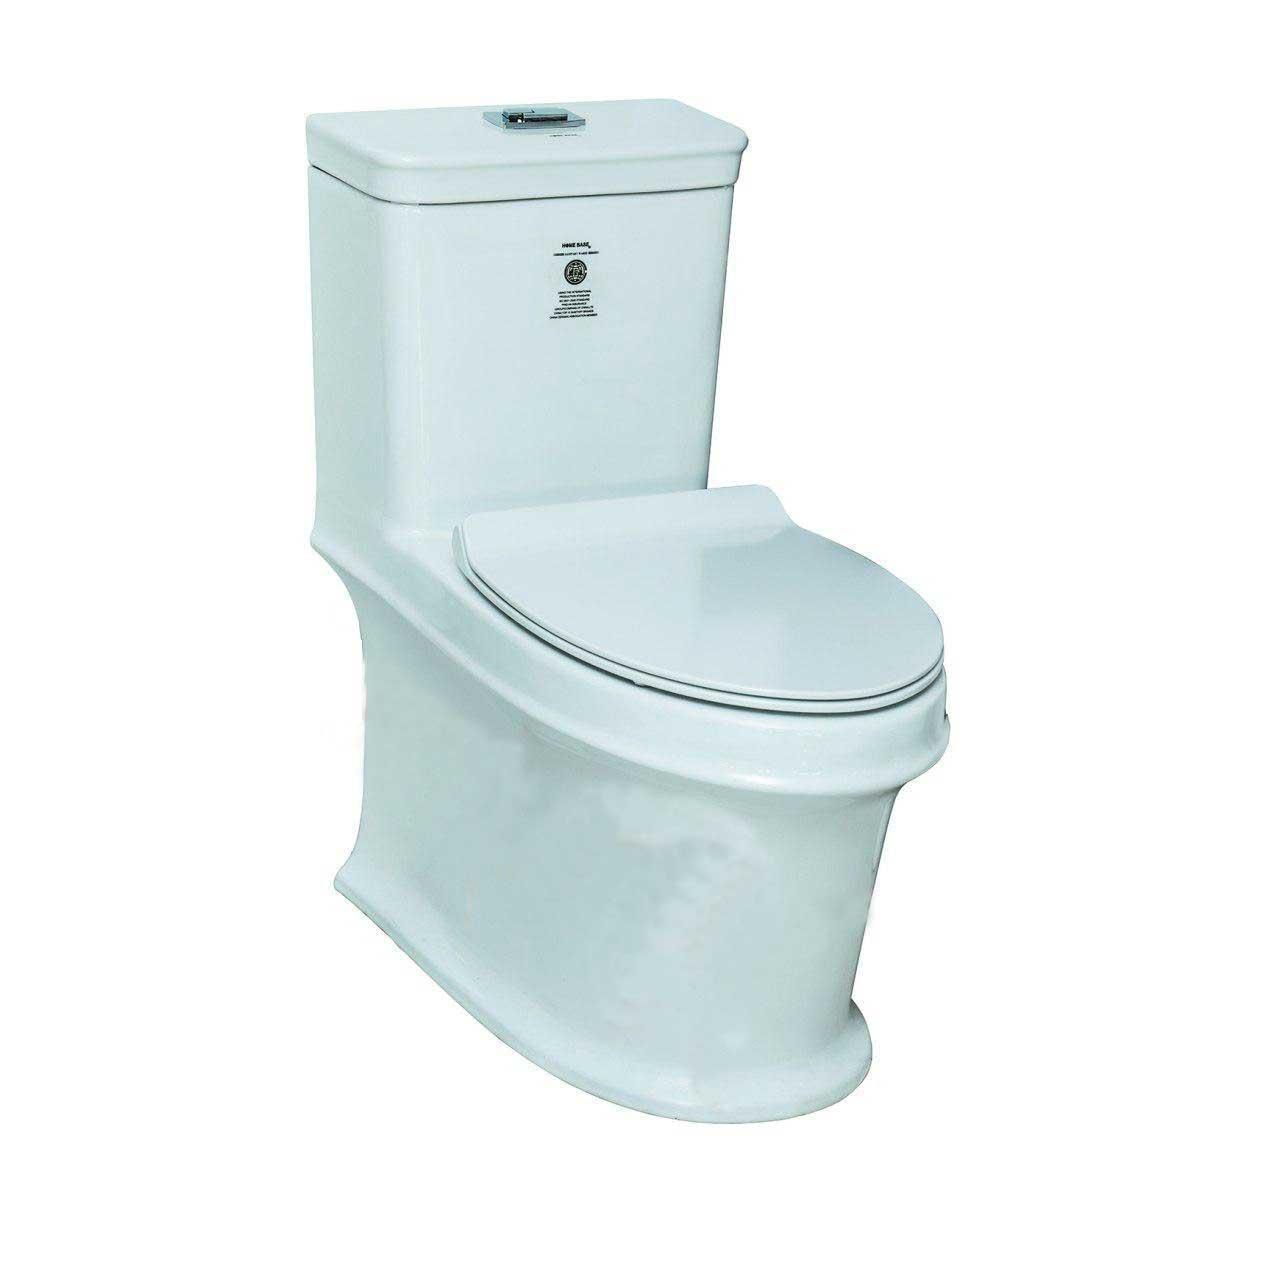 توالت فرنگی HOME BASE مدل HBJT 0308 W